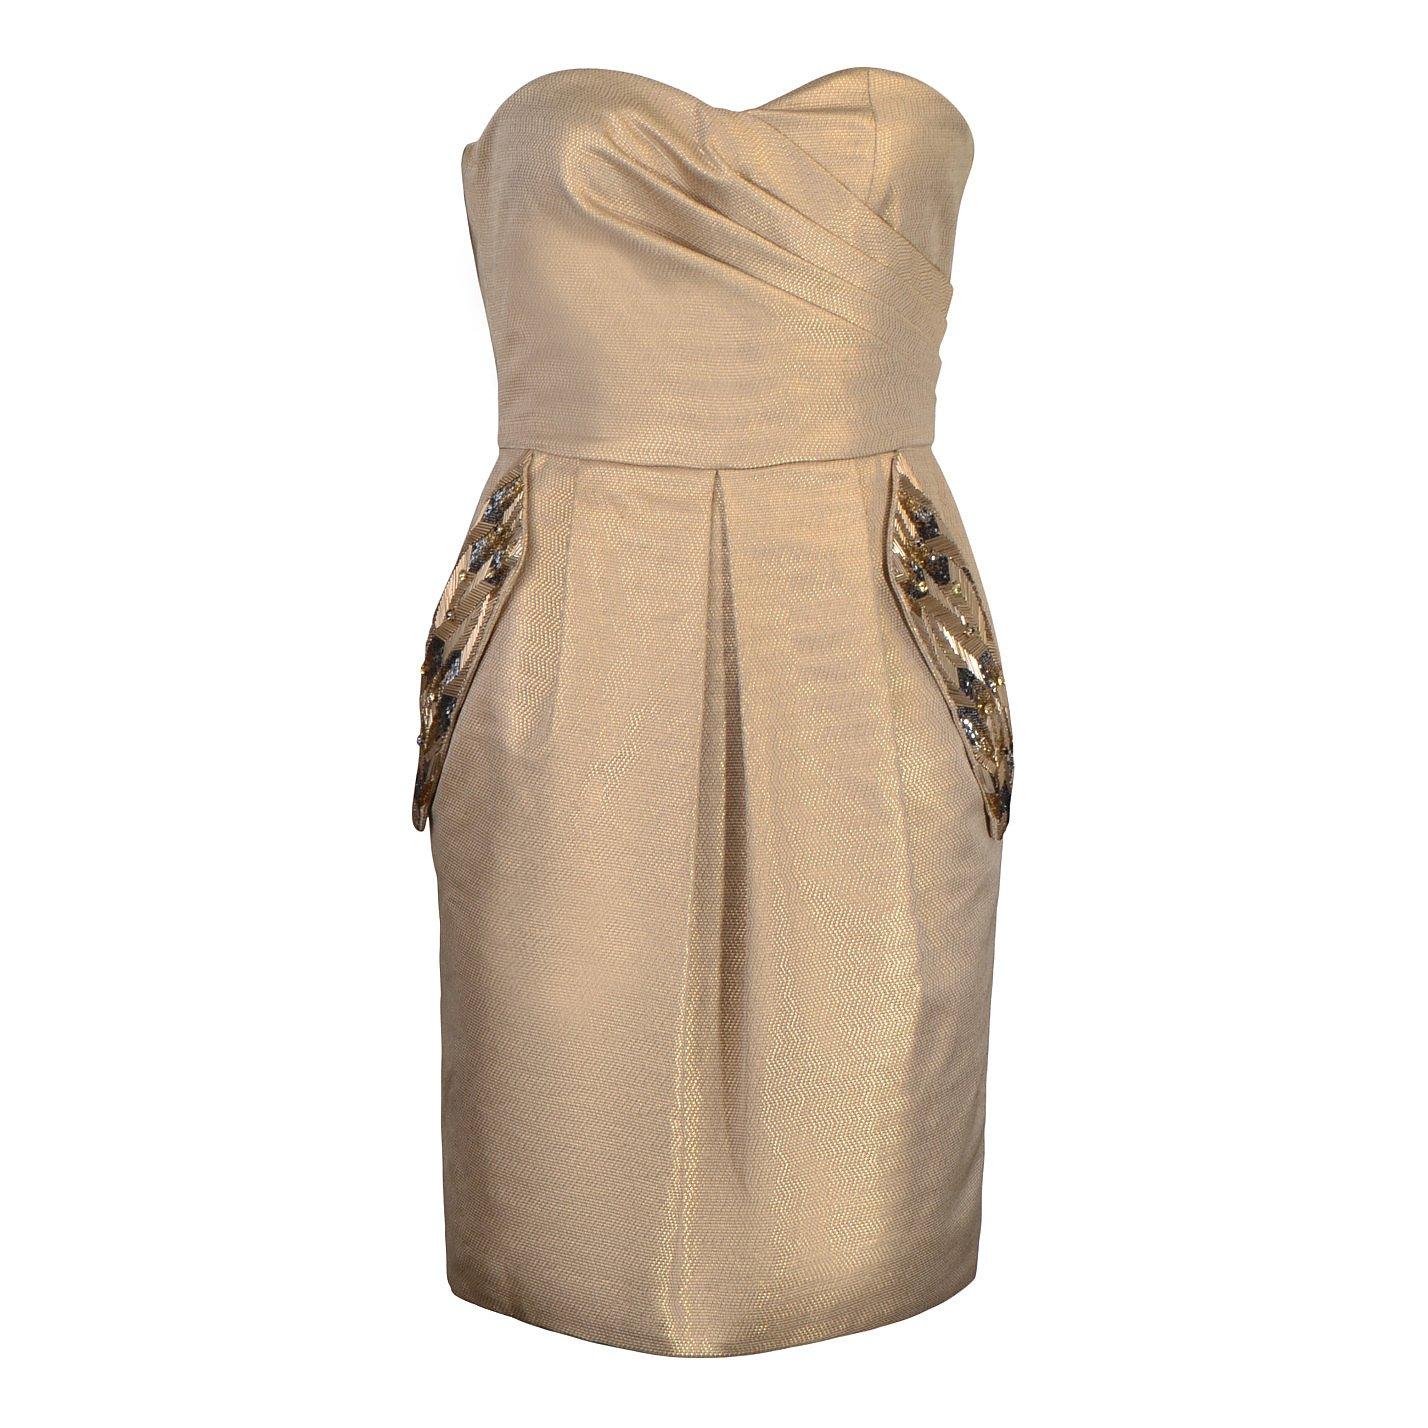 Matthew Williamson Metallic Corset Dress